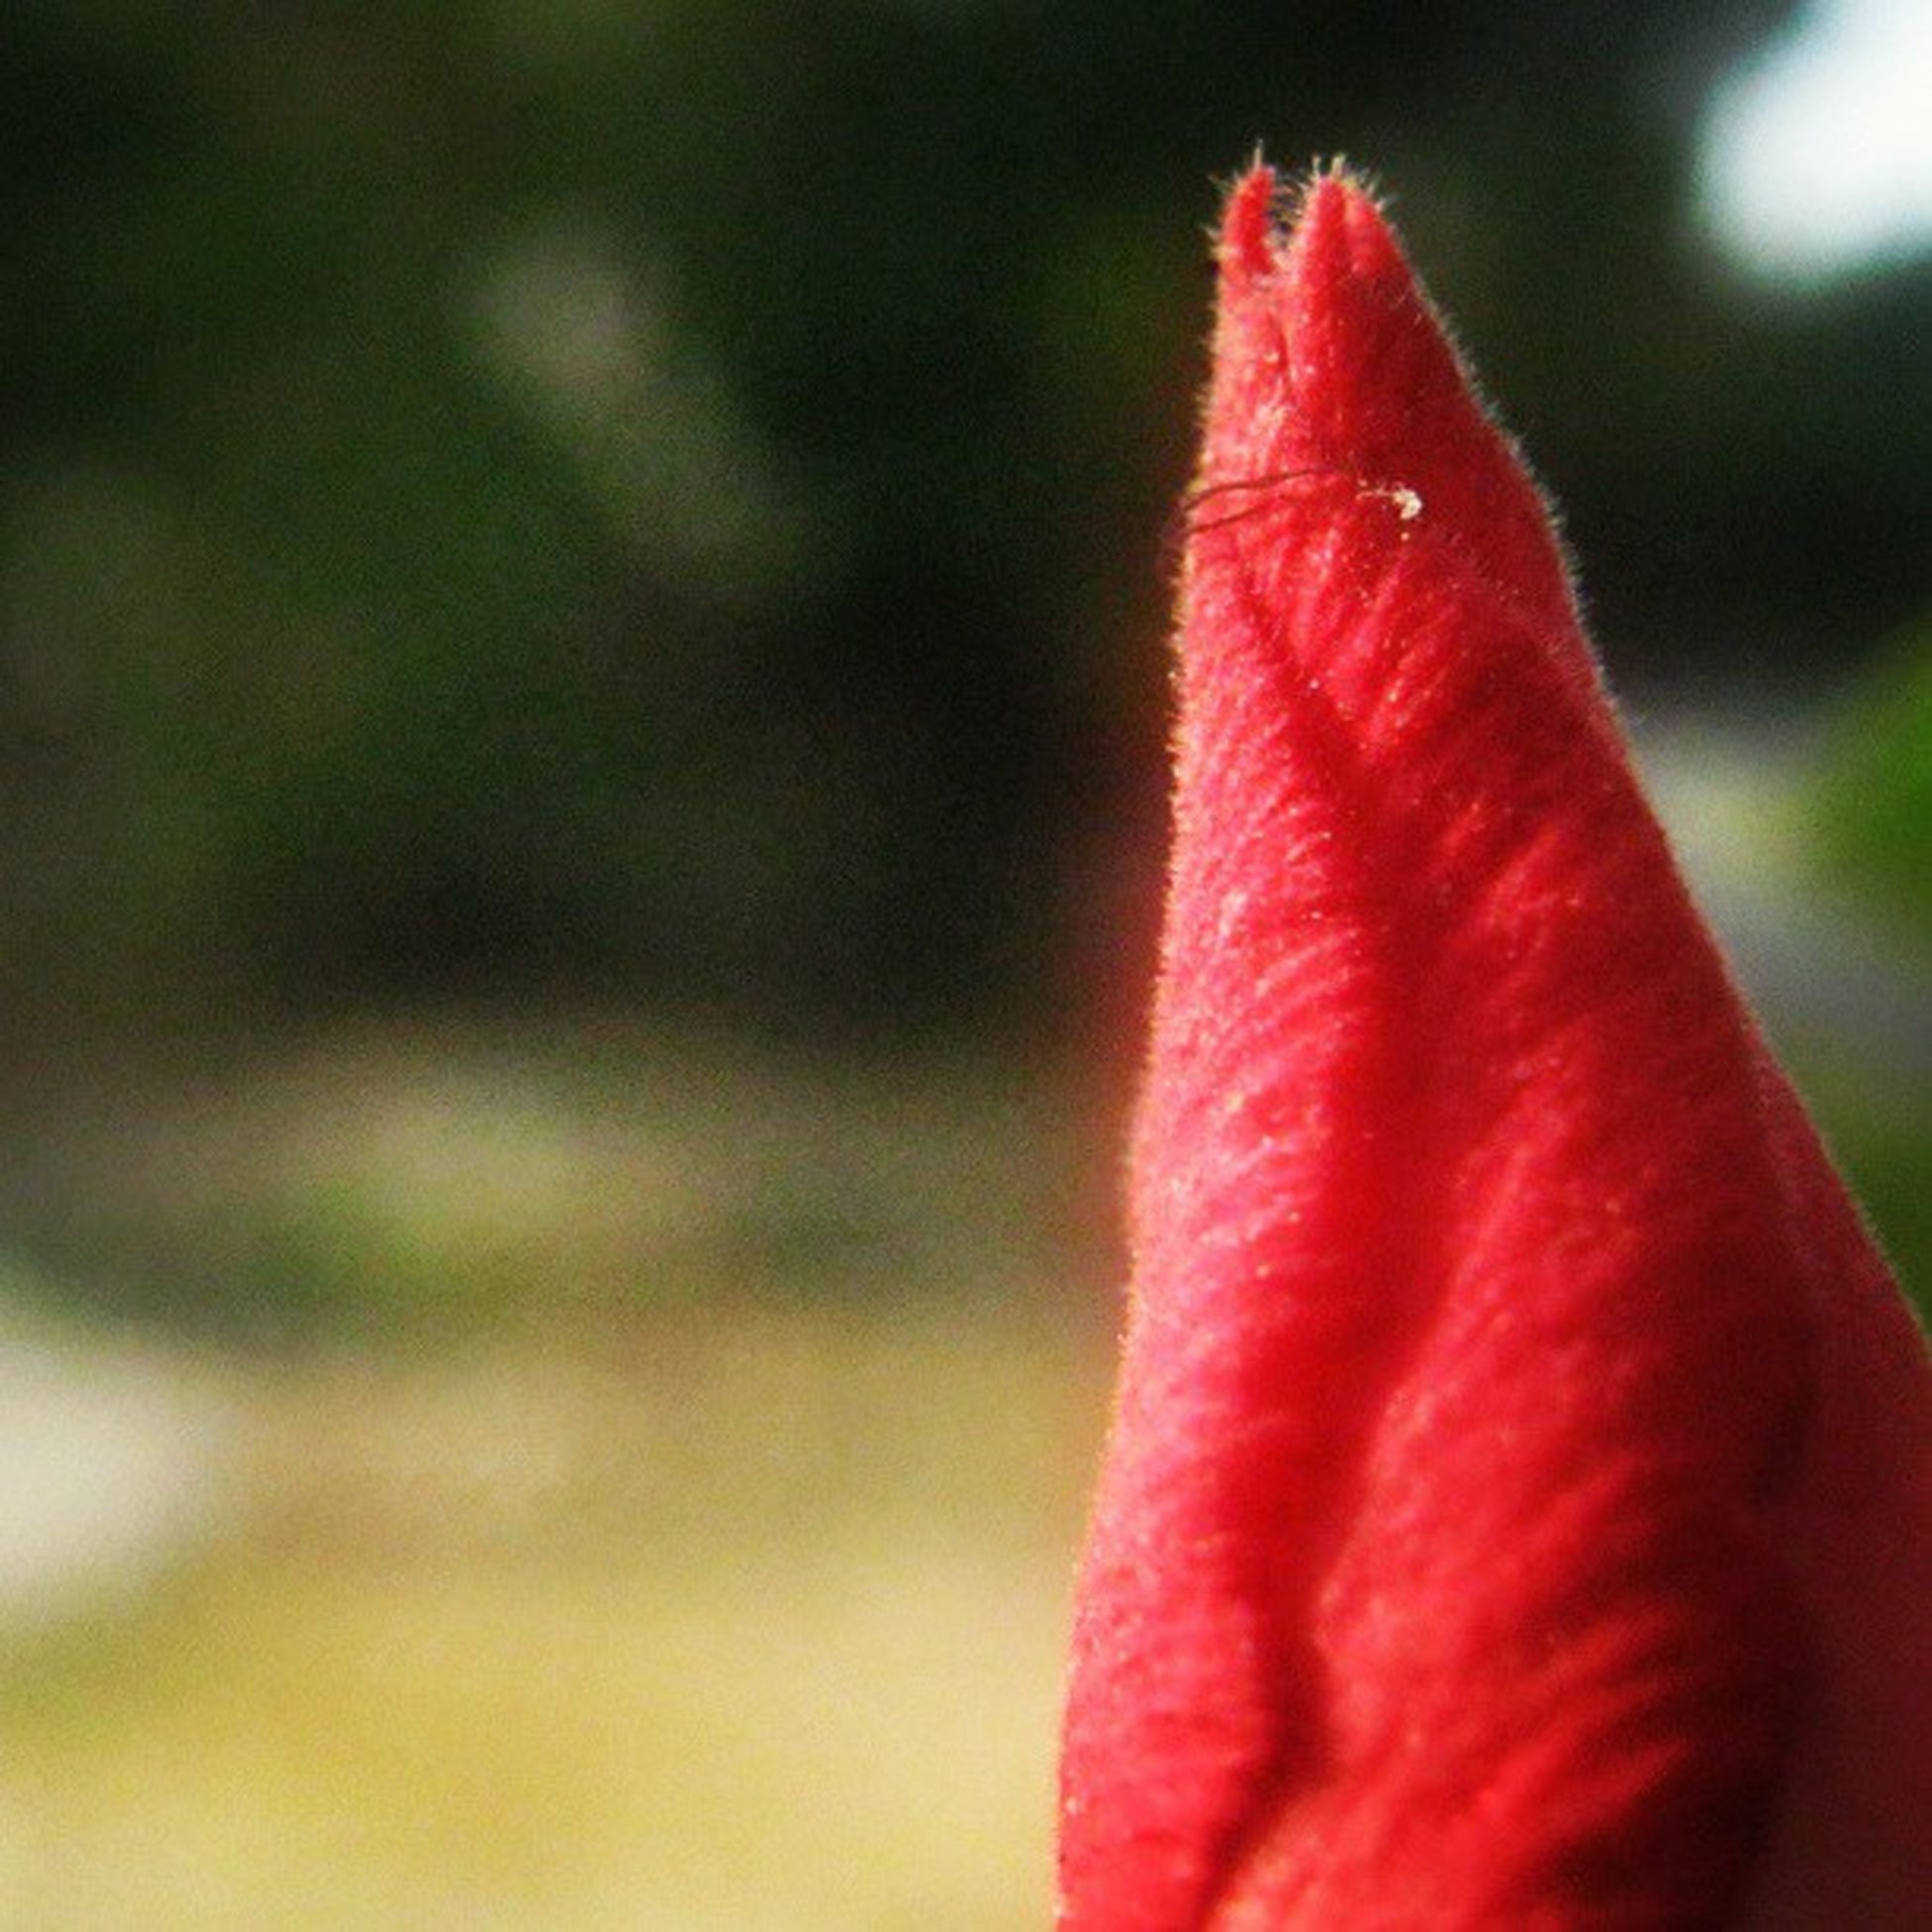 [ pucuk ] Flower Red Adenium Waykanan lampung indonesia instanusantara naturekingdom koolplant nature